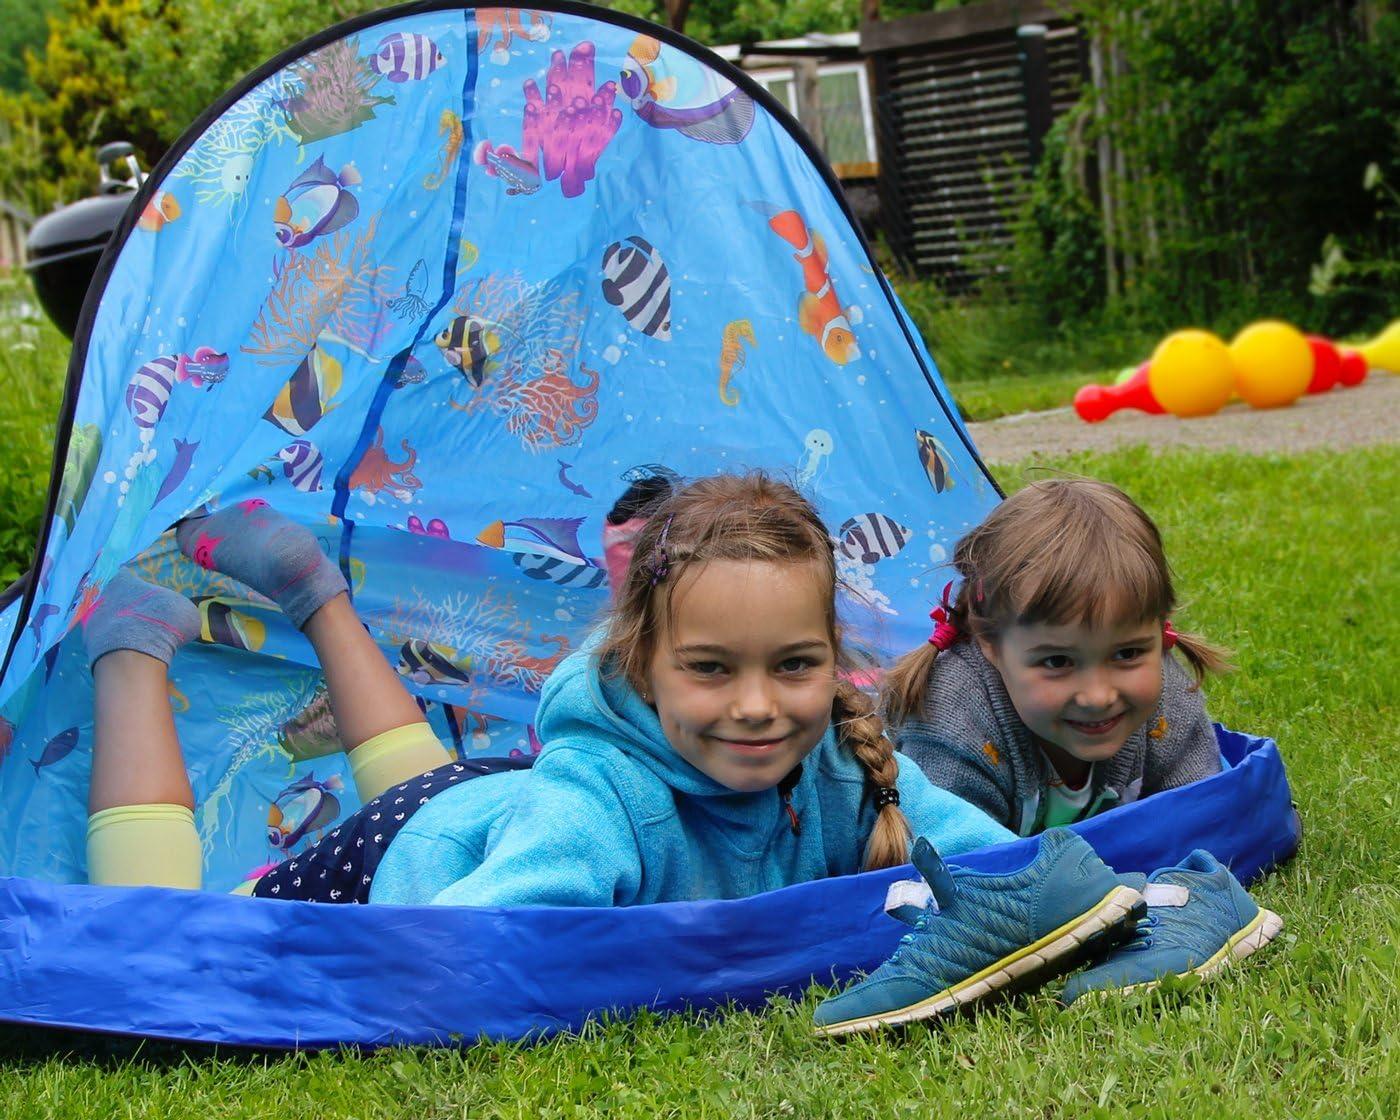 Ondis24 Strandmuschel Wurfzelt Spielzelt Kinderzelt Pop Up